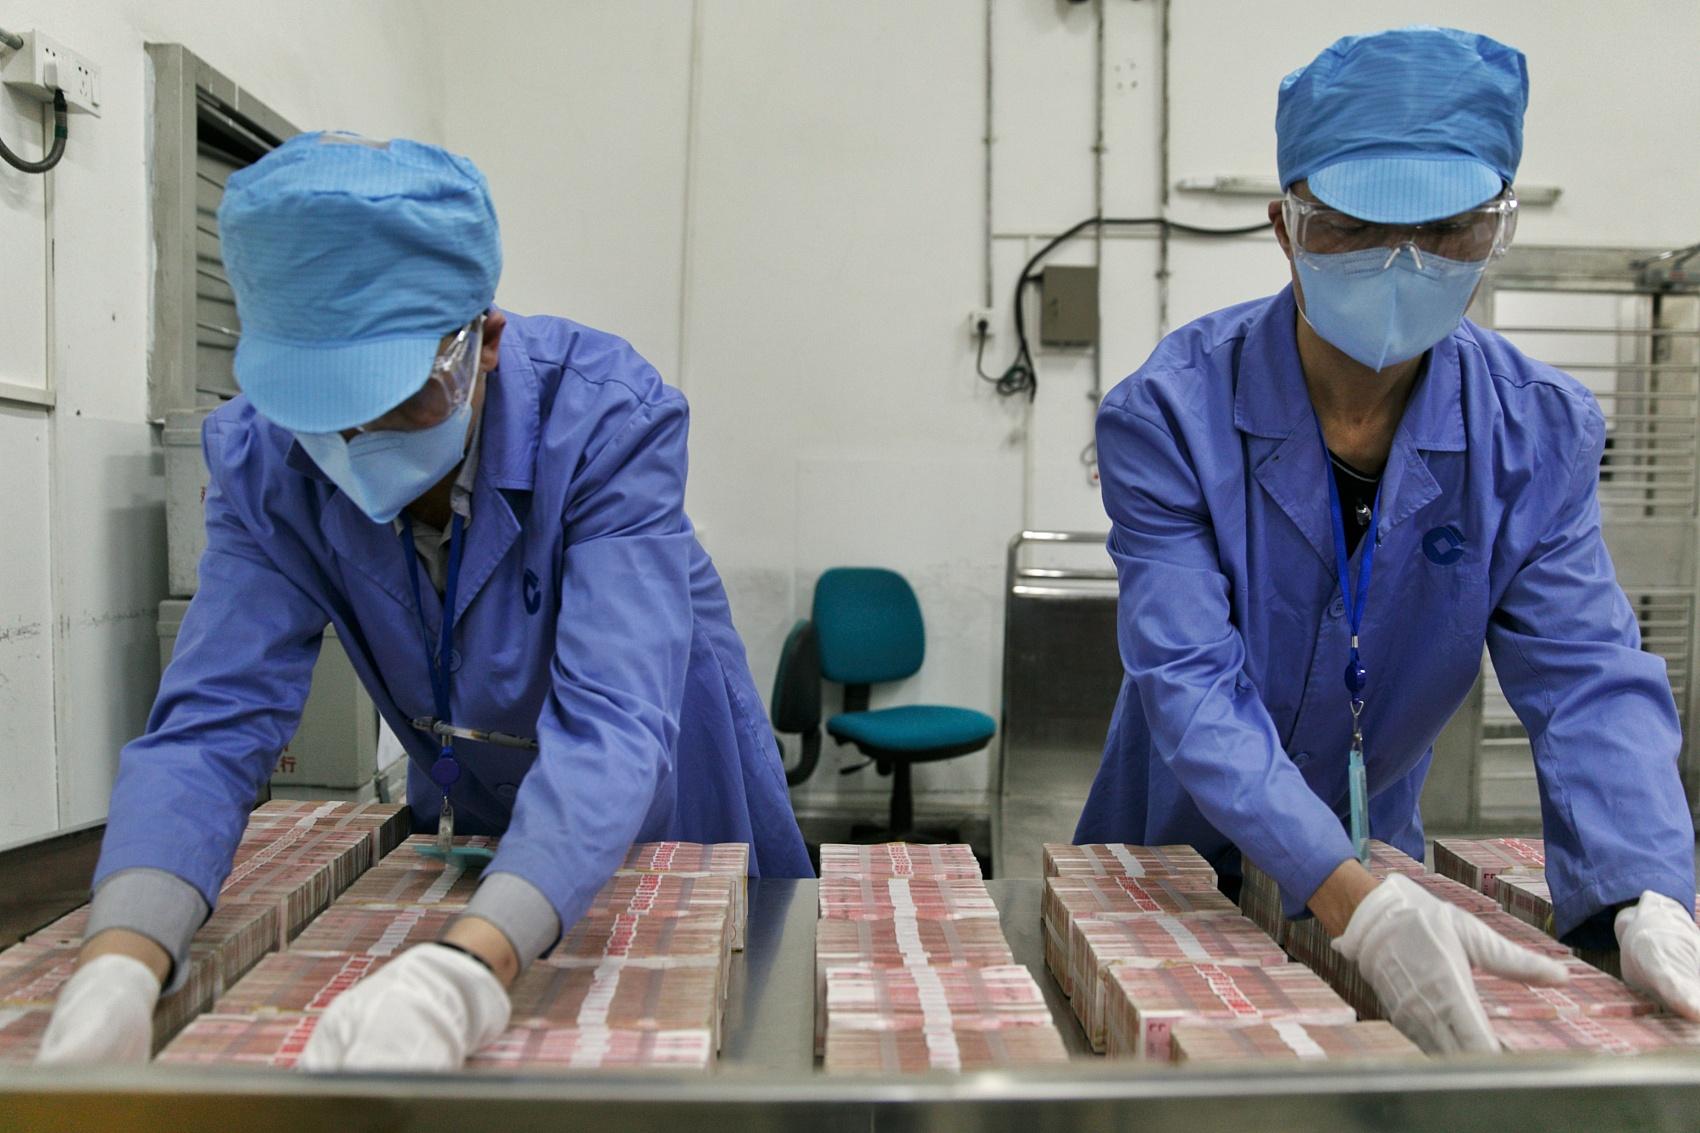 China to pilot regulations on large cash transactions